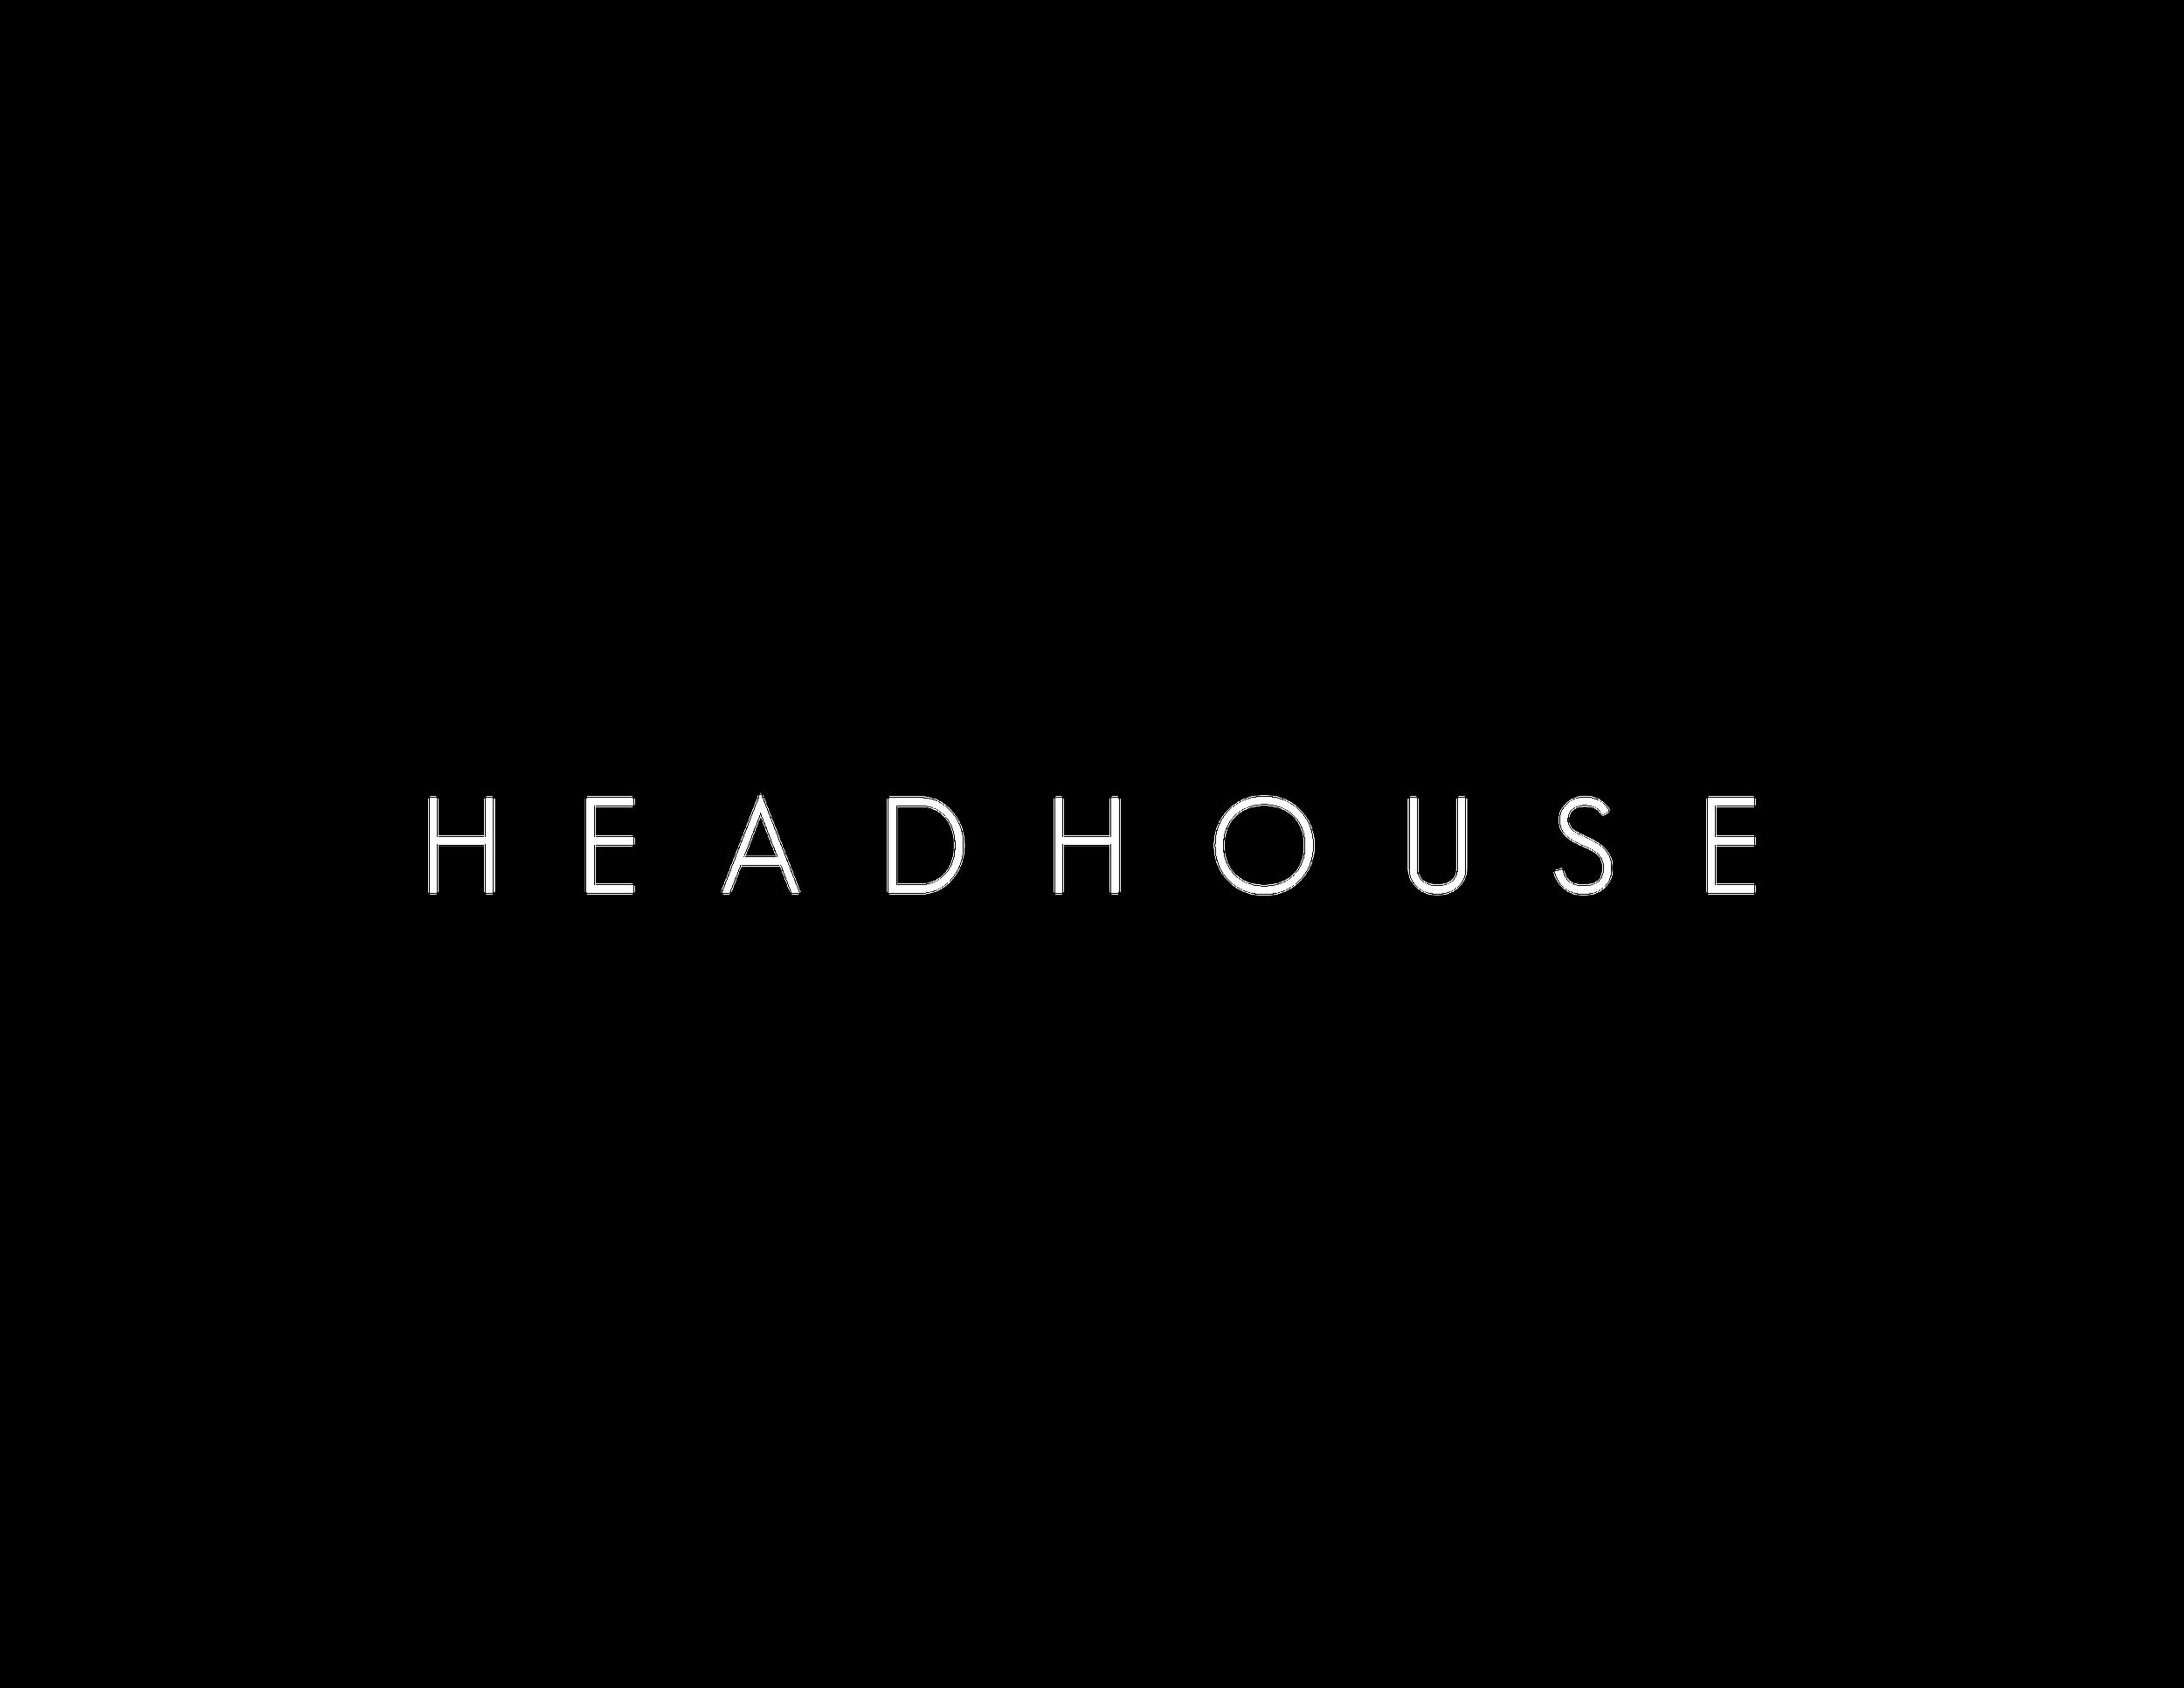 Headhouse-Logo